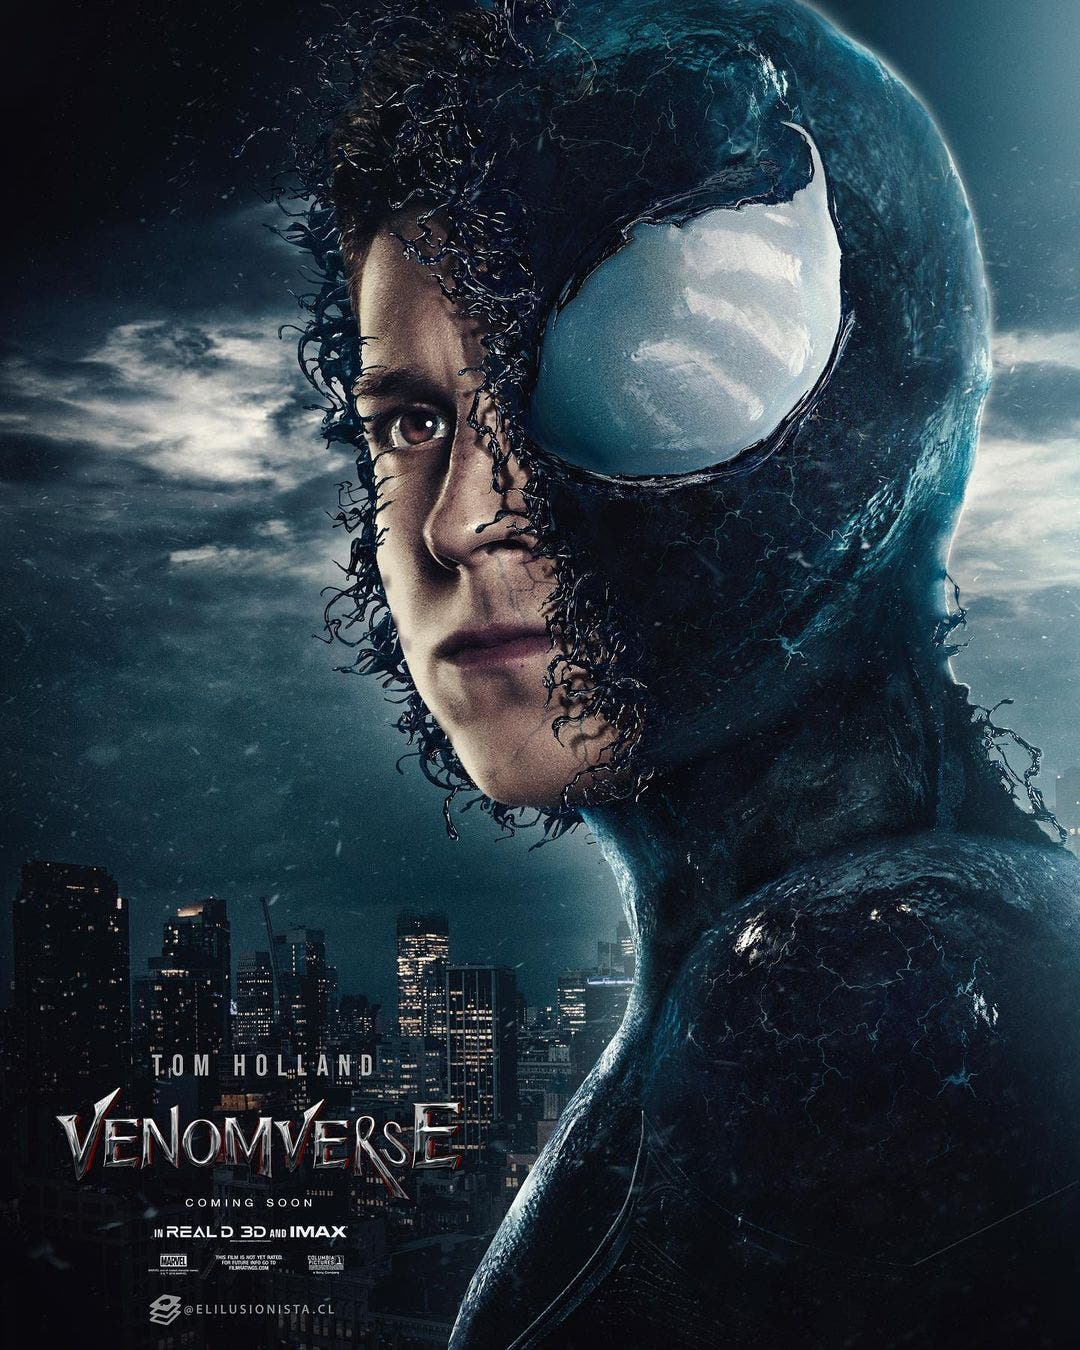 Tom Holland Spider-man Venom